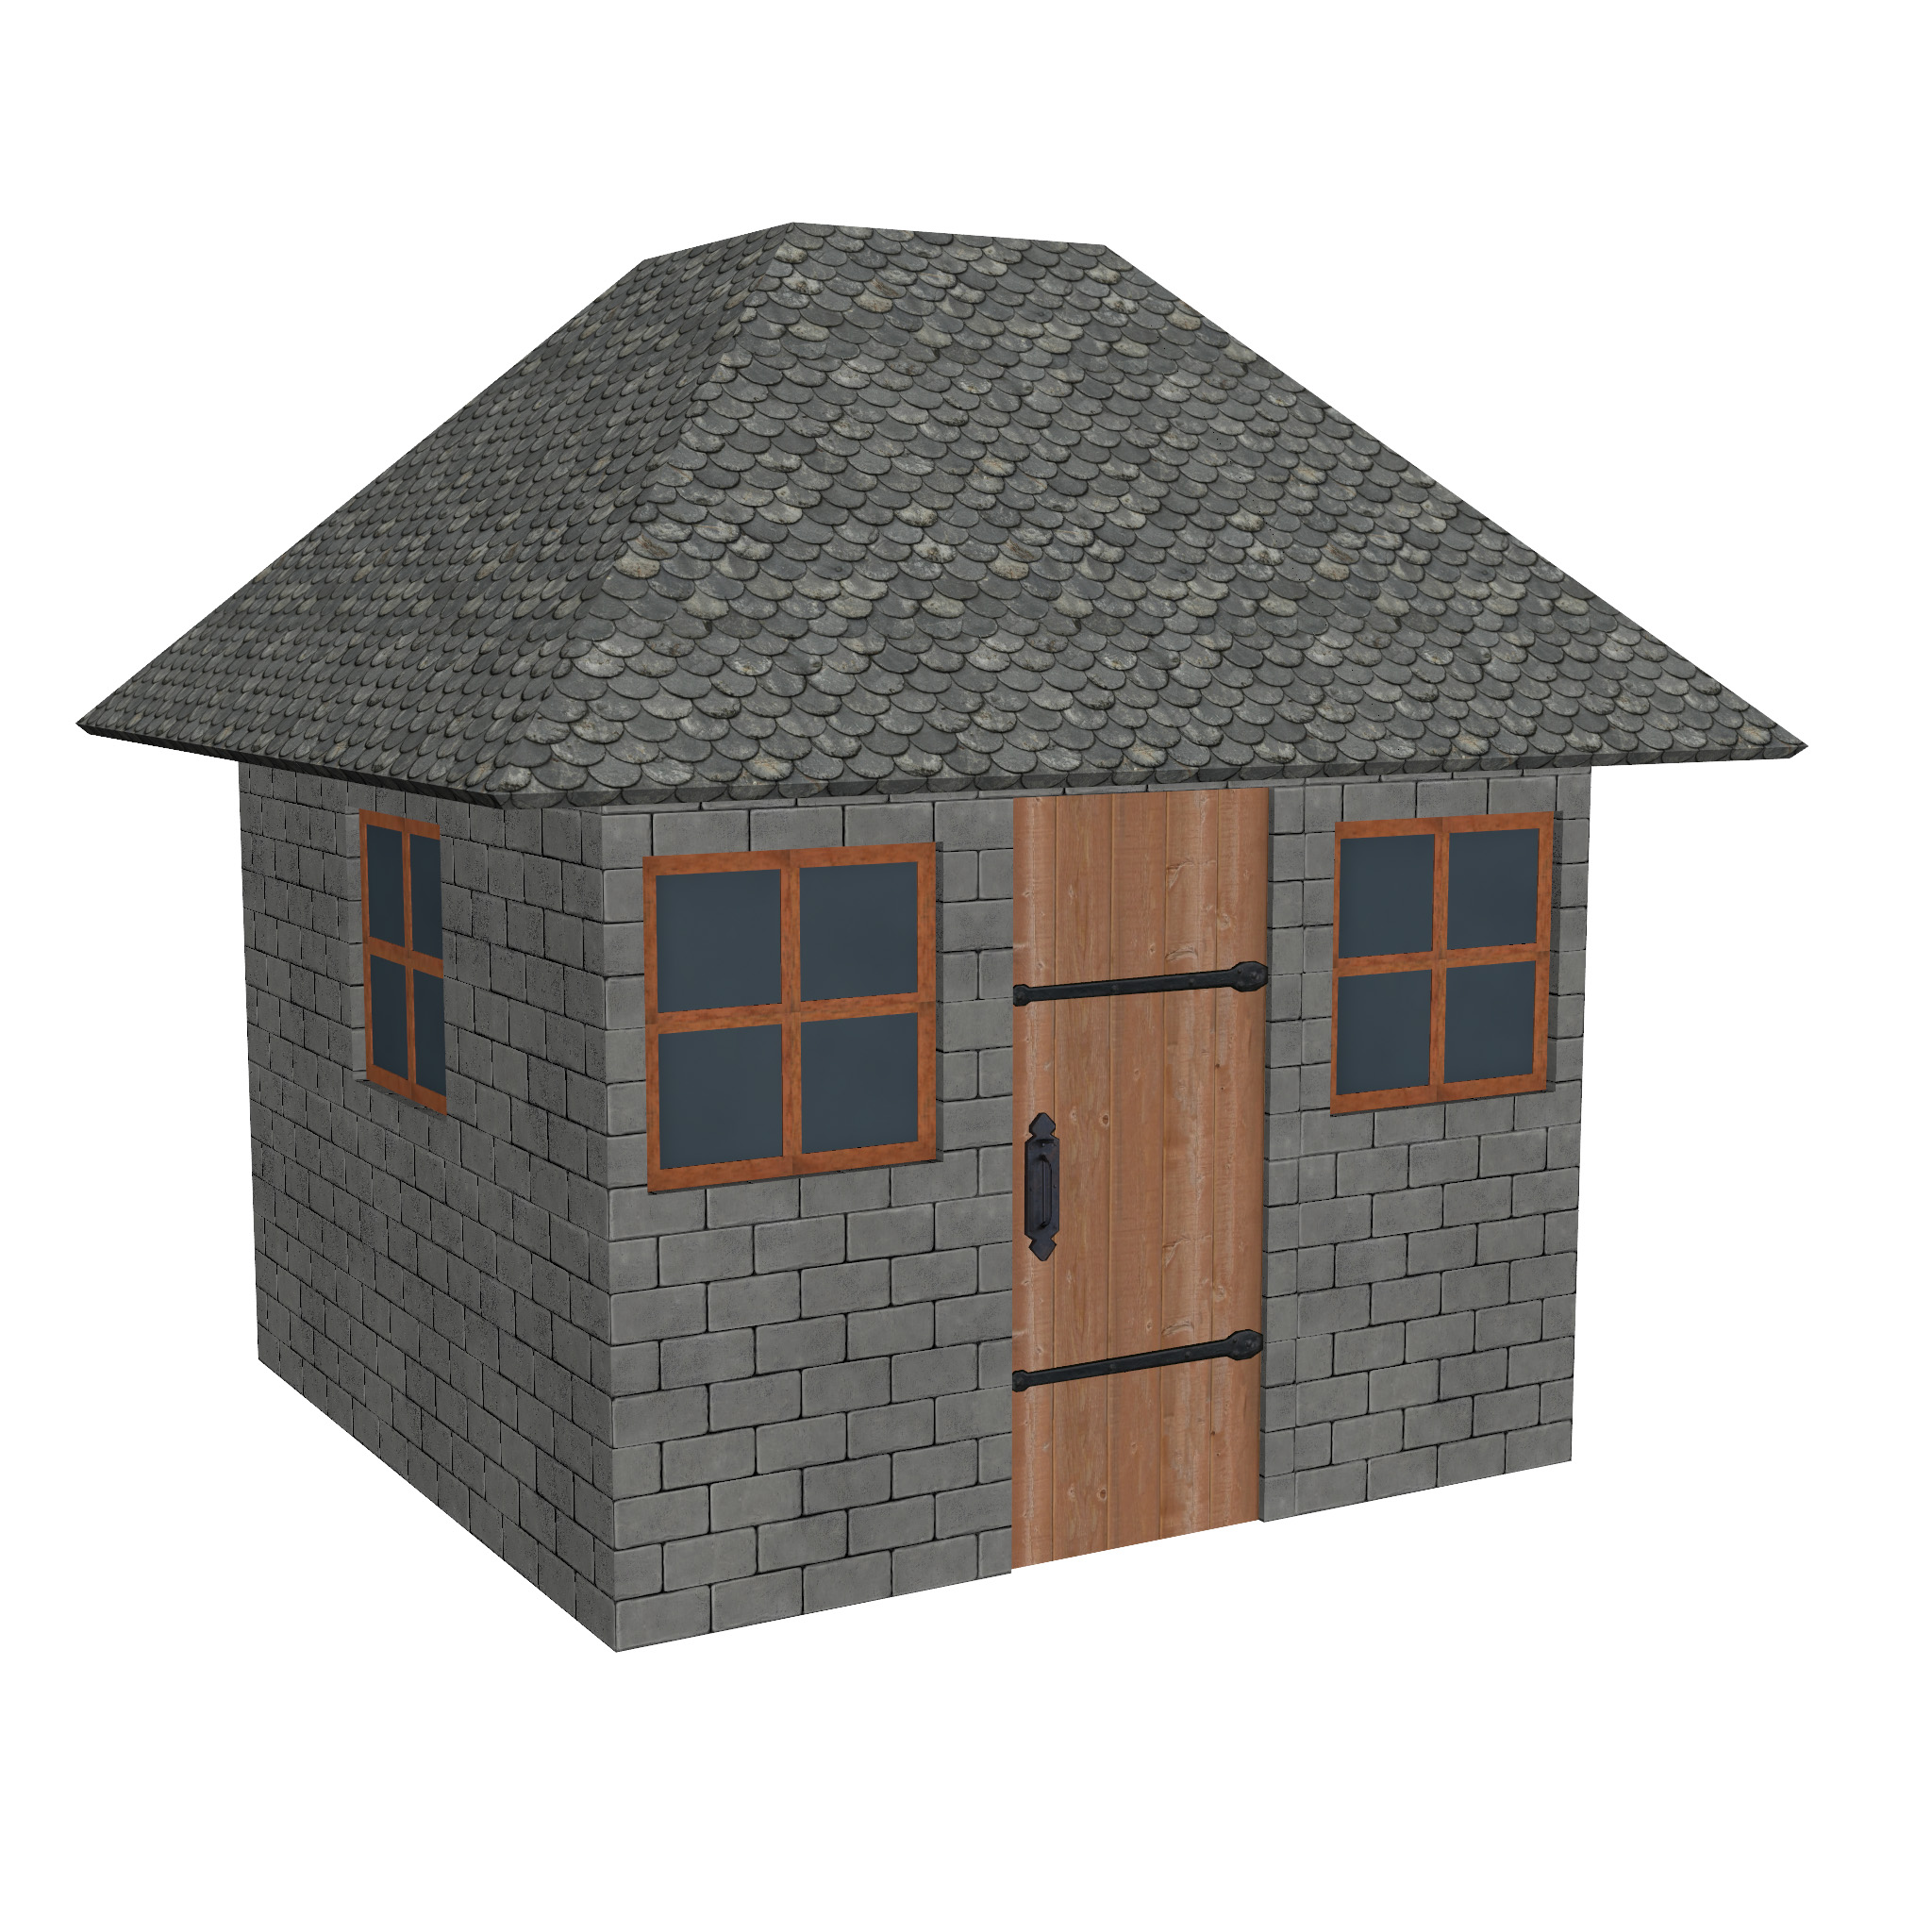 modular brick house set 3d model fbx ma mb 271420